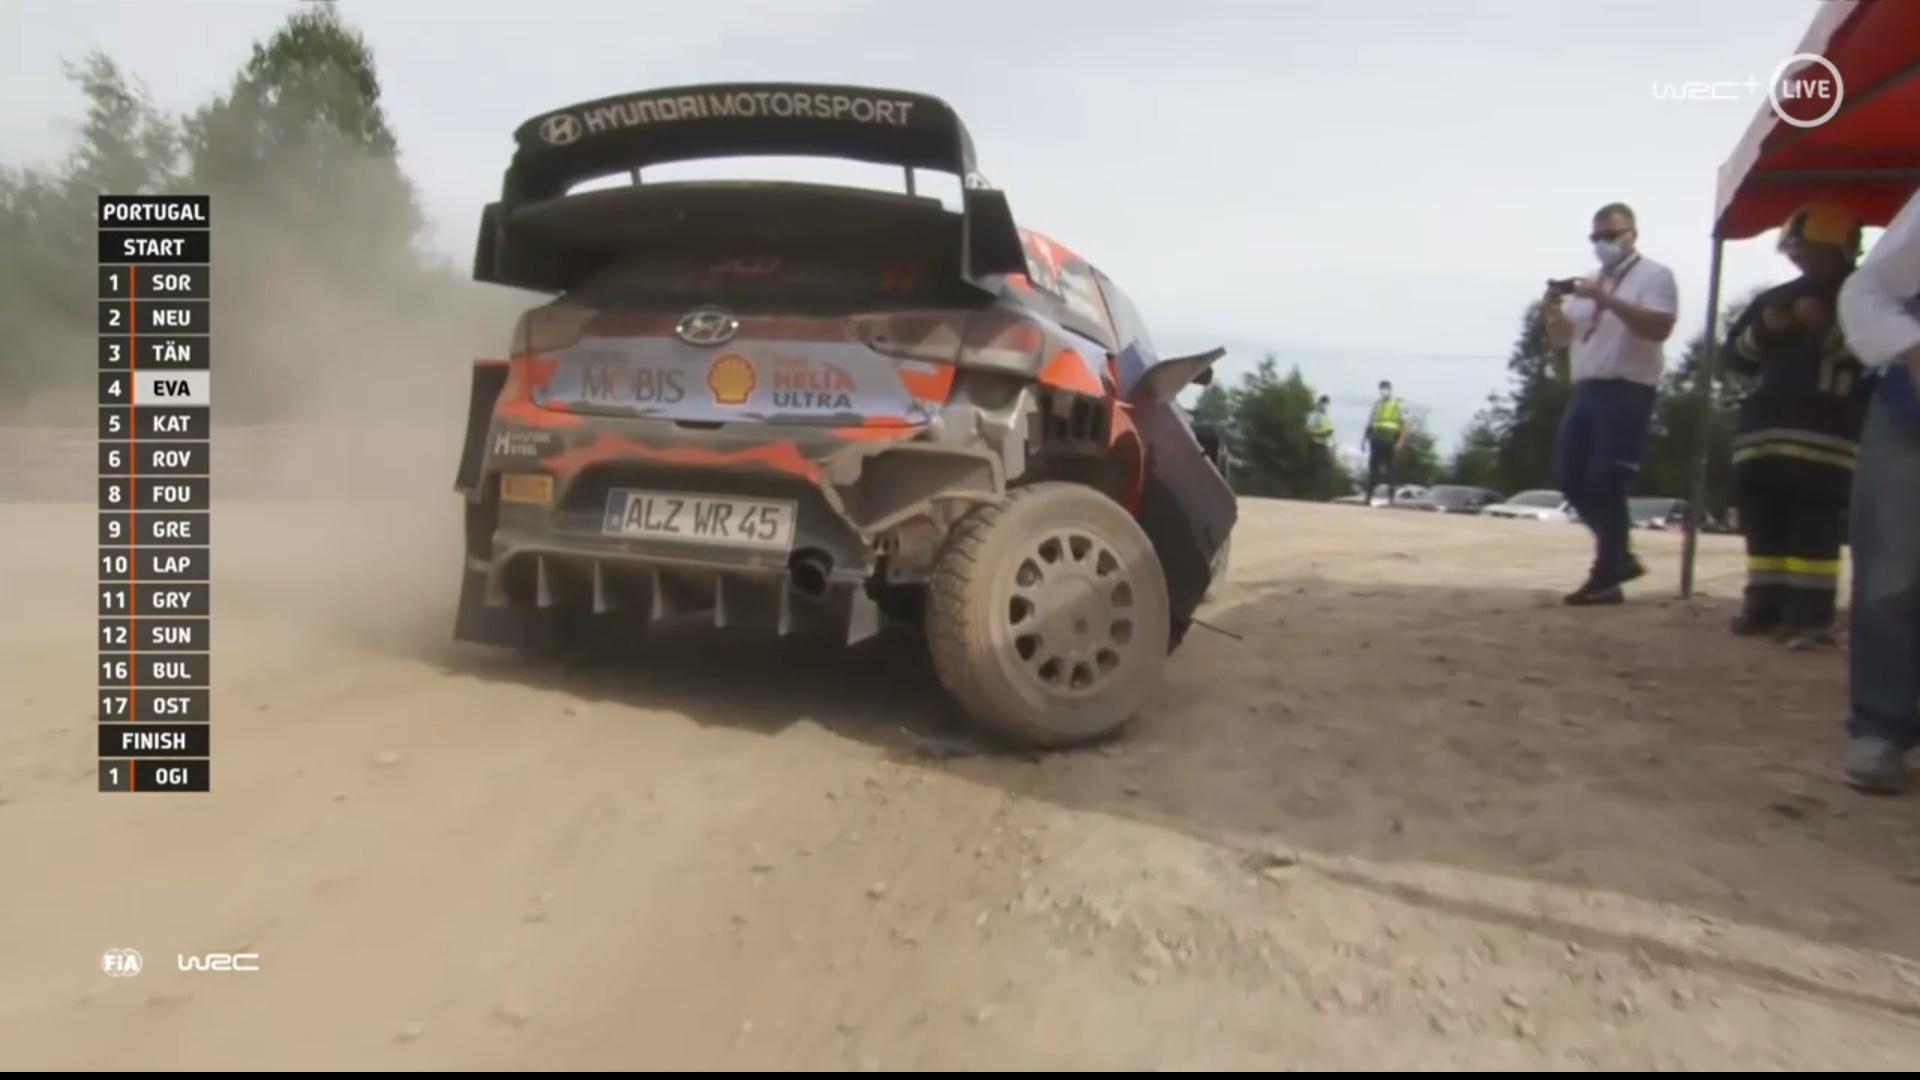 WRC: 54º Vodafone Rallye de Portugal [20-23 de Mayo] - Página 4 68111_e16-nj9wyaczeqc